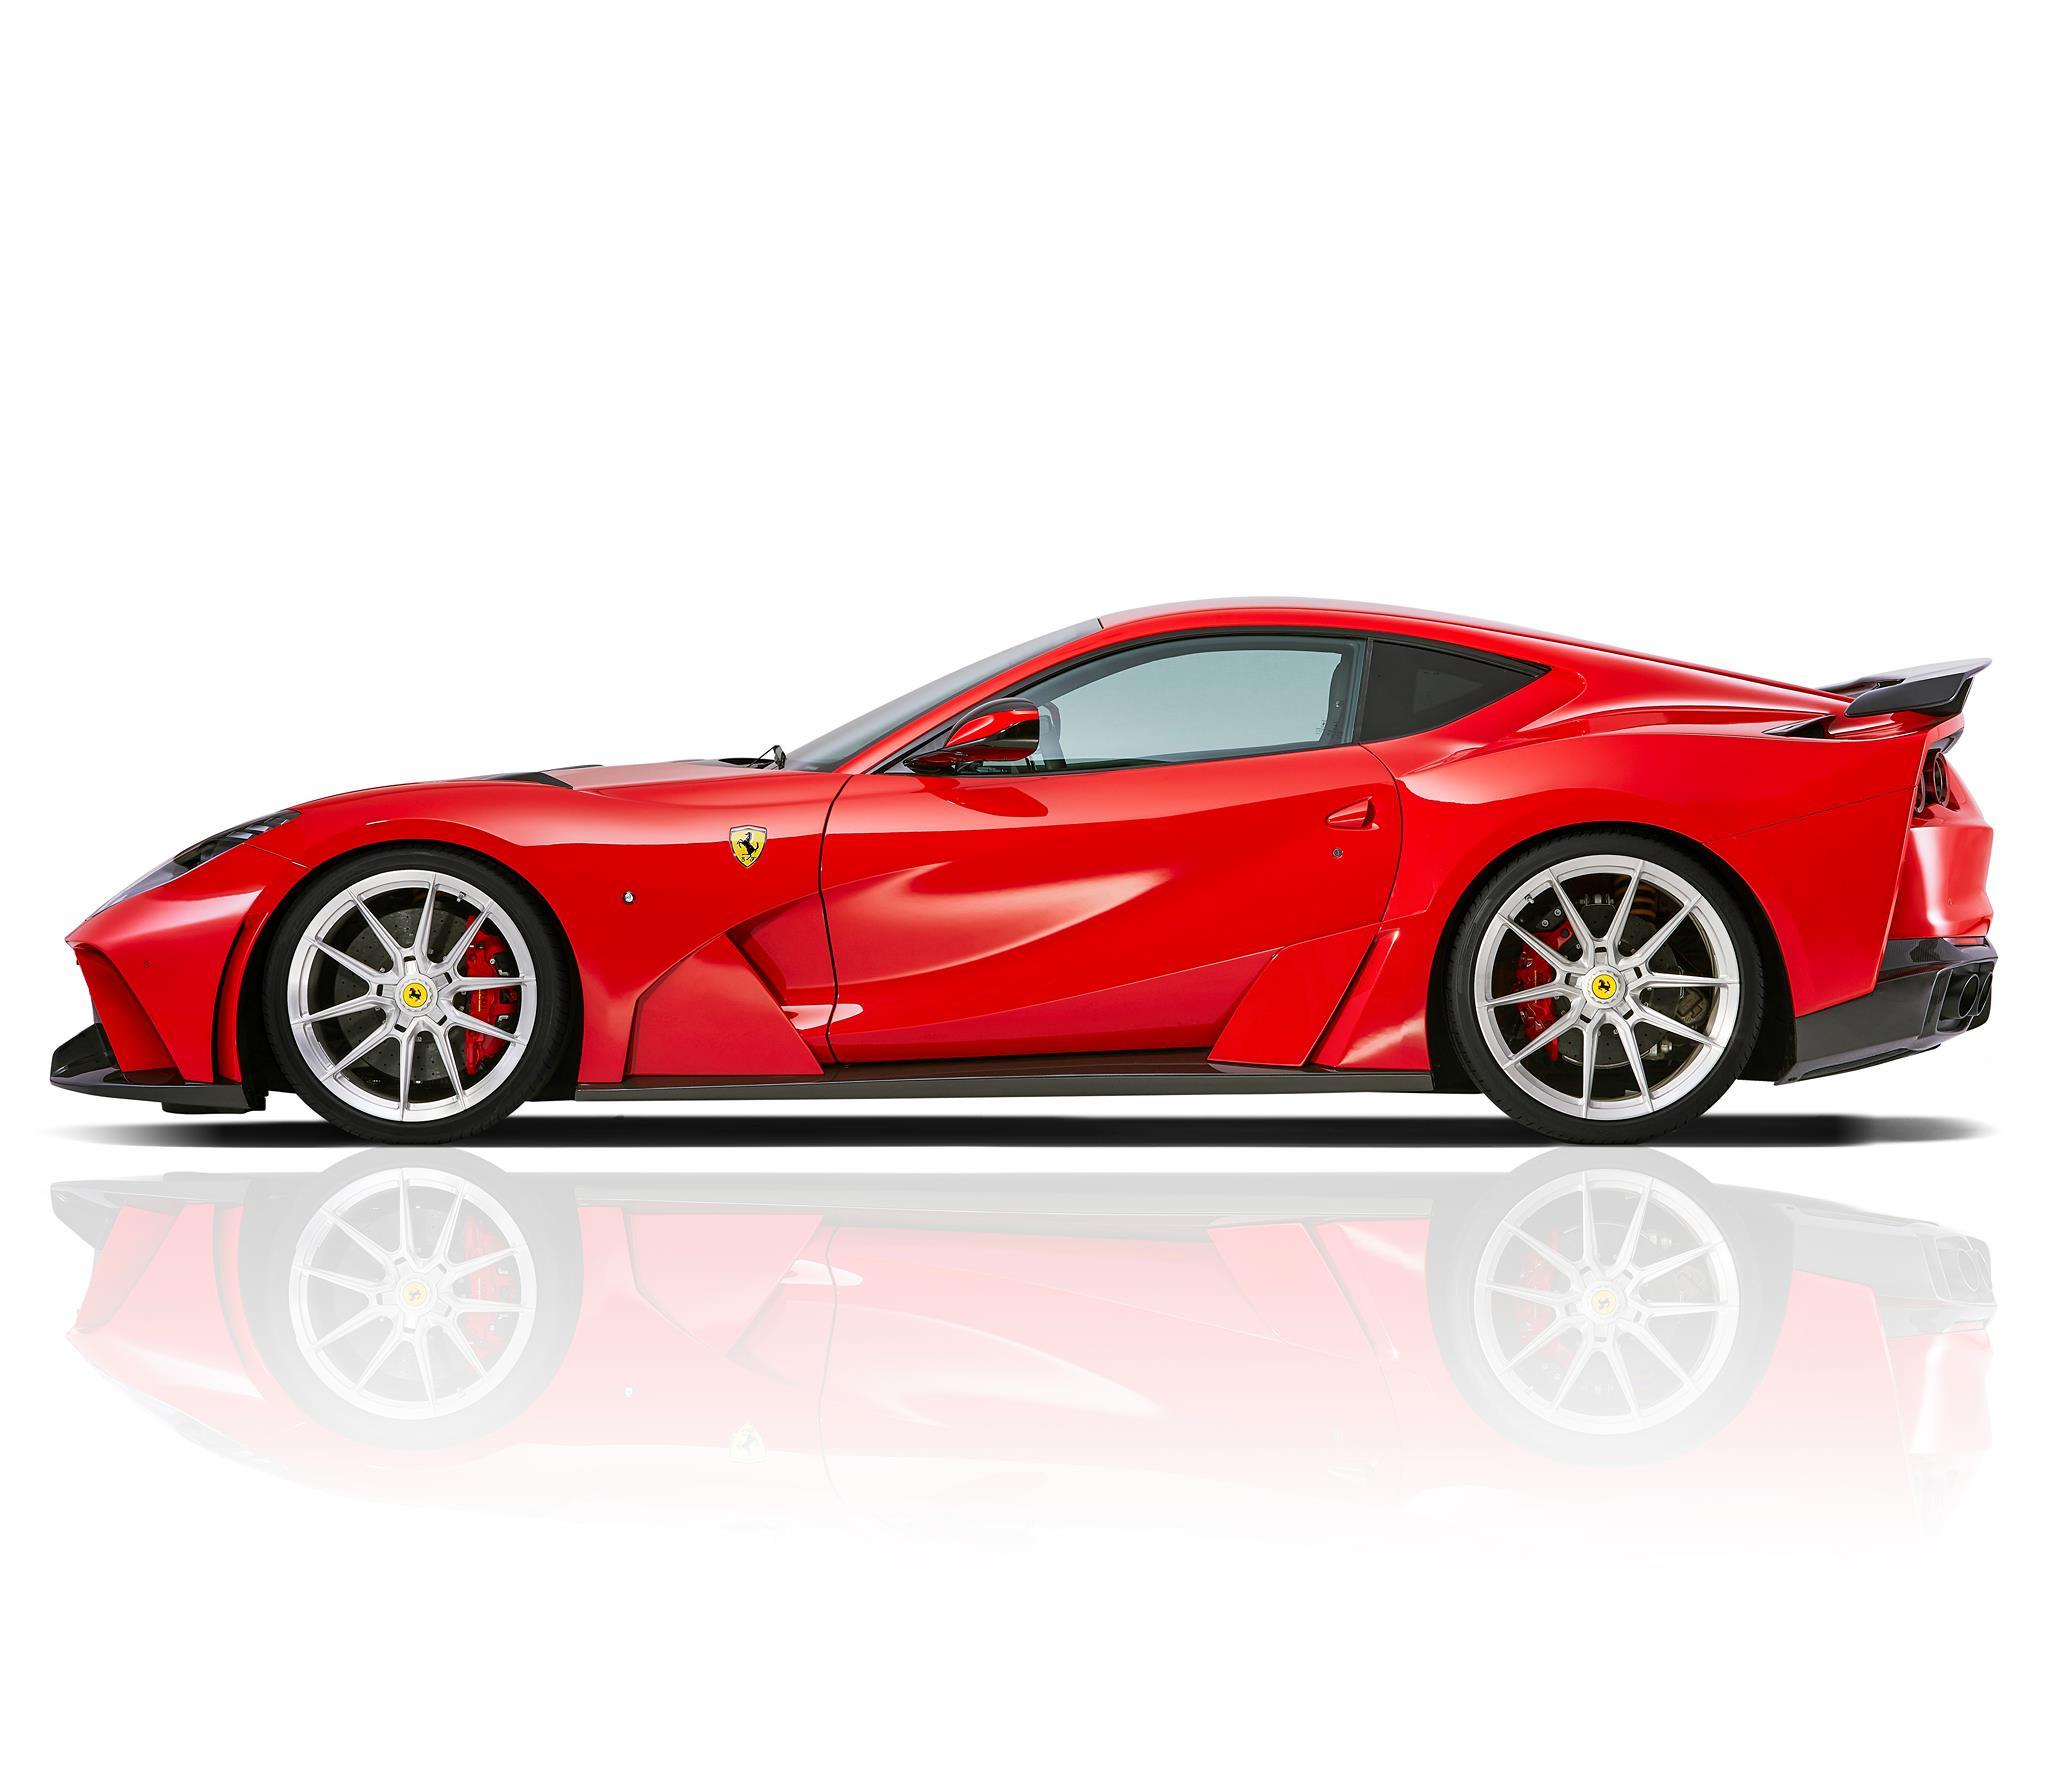 Ferrari-812-Superfast-N-Largo-by-Novitec-23